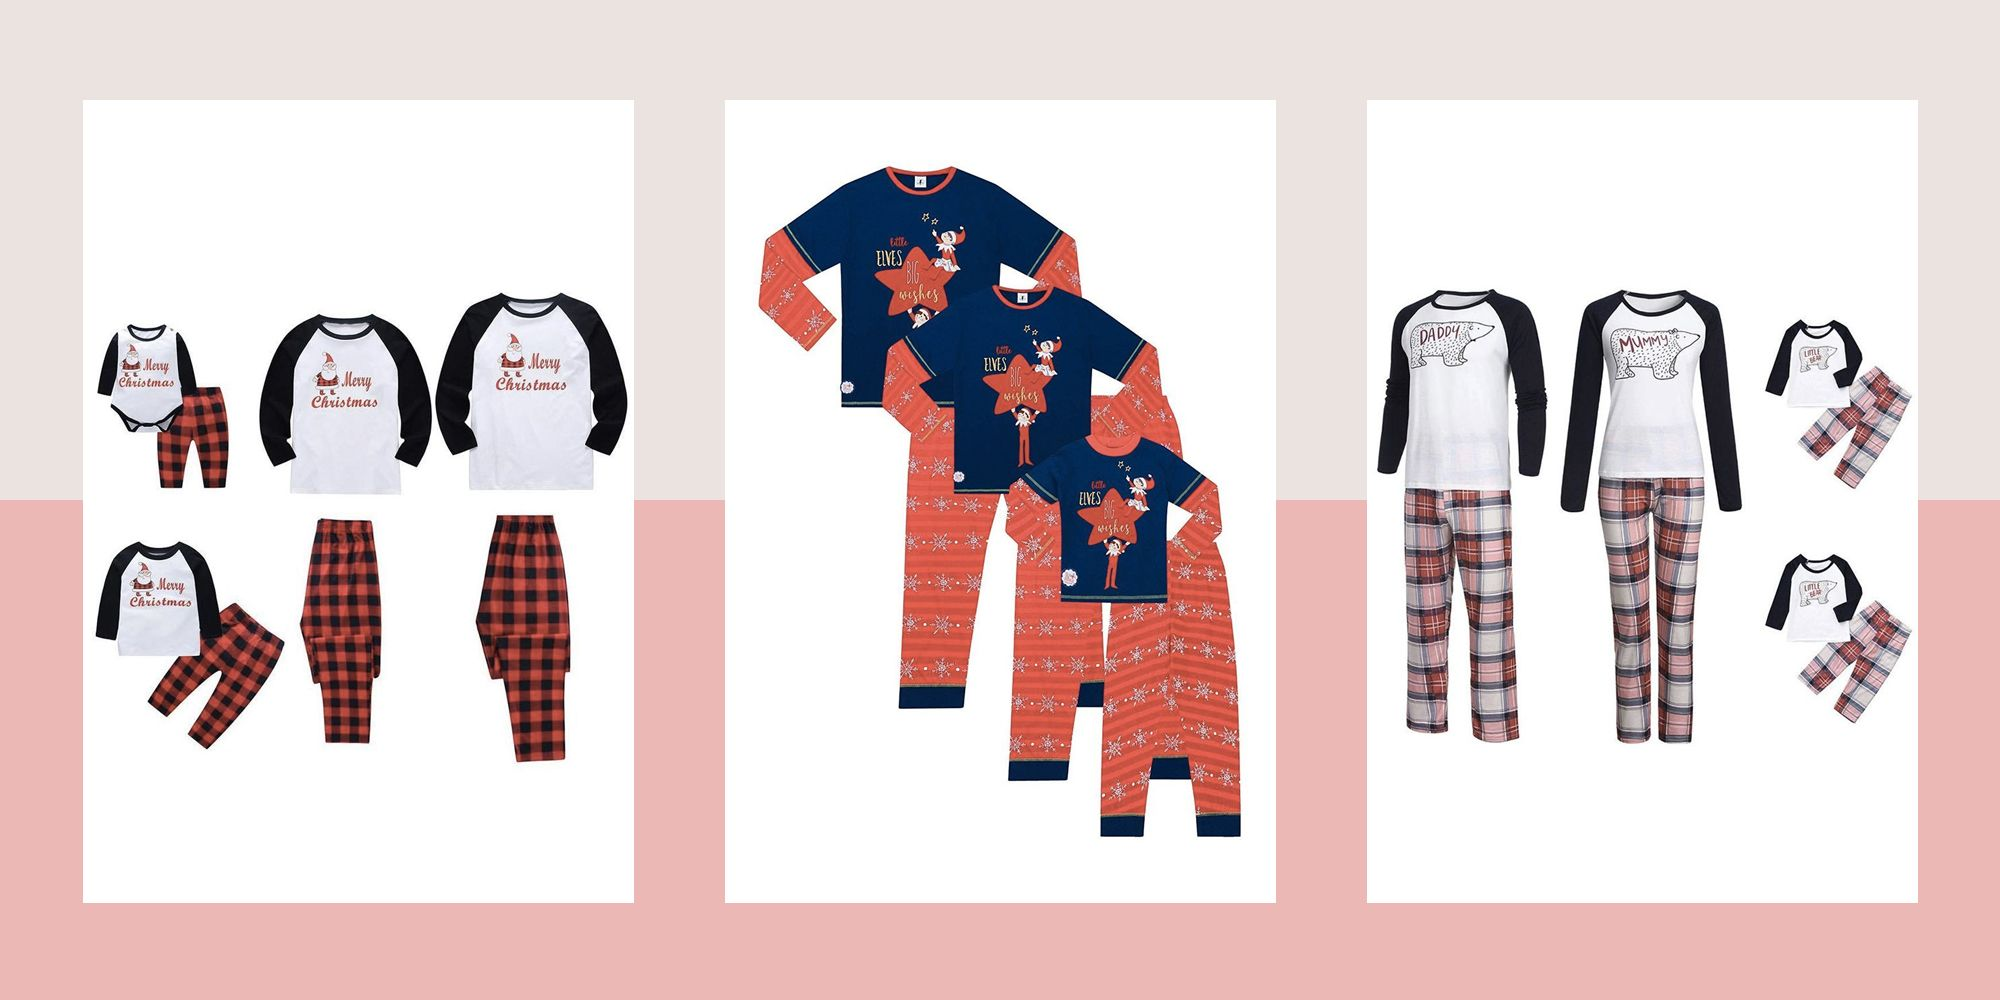 Family Christmas Pajamas 2019 Uk.Best Matching Family Christmas Pyjamas Family Christmas